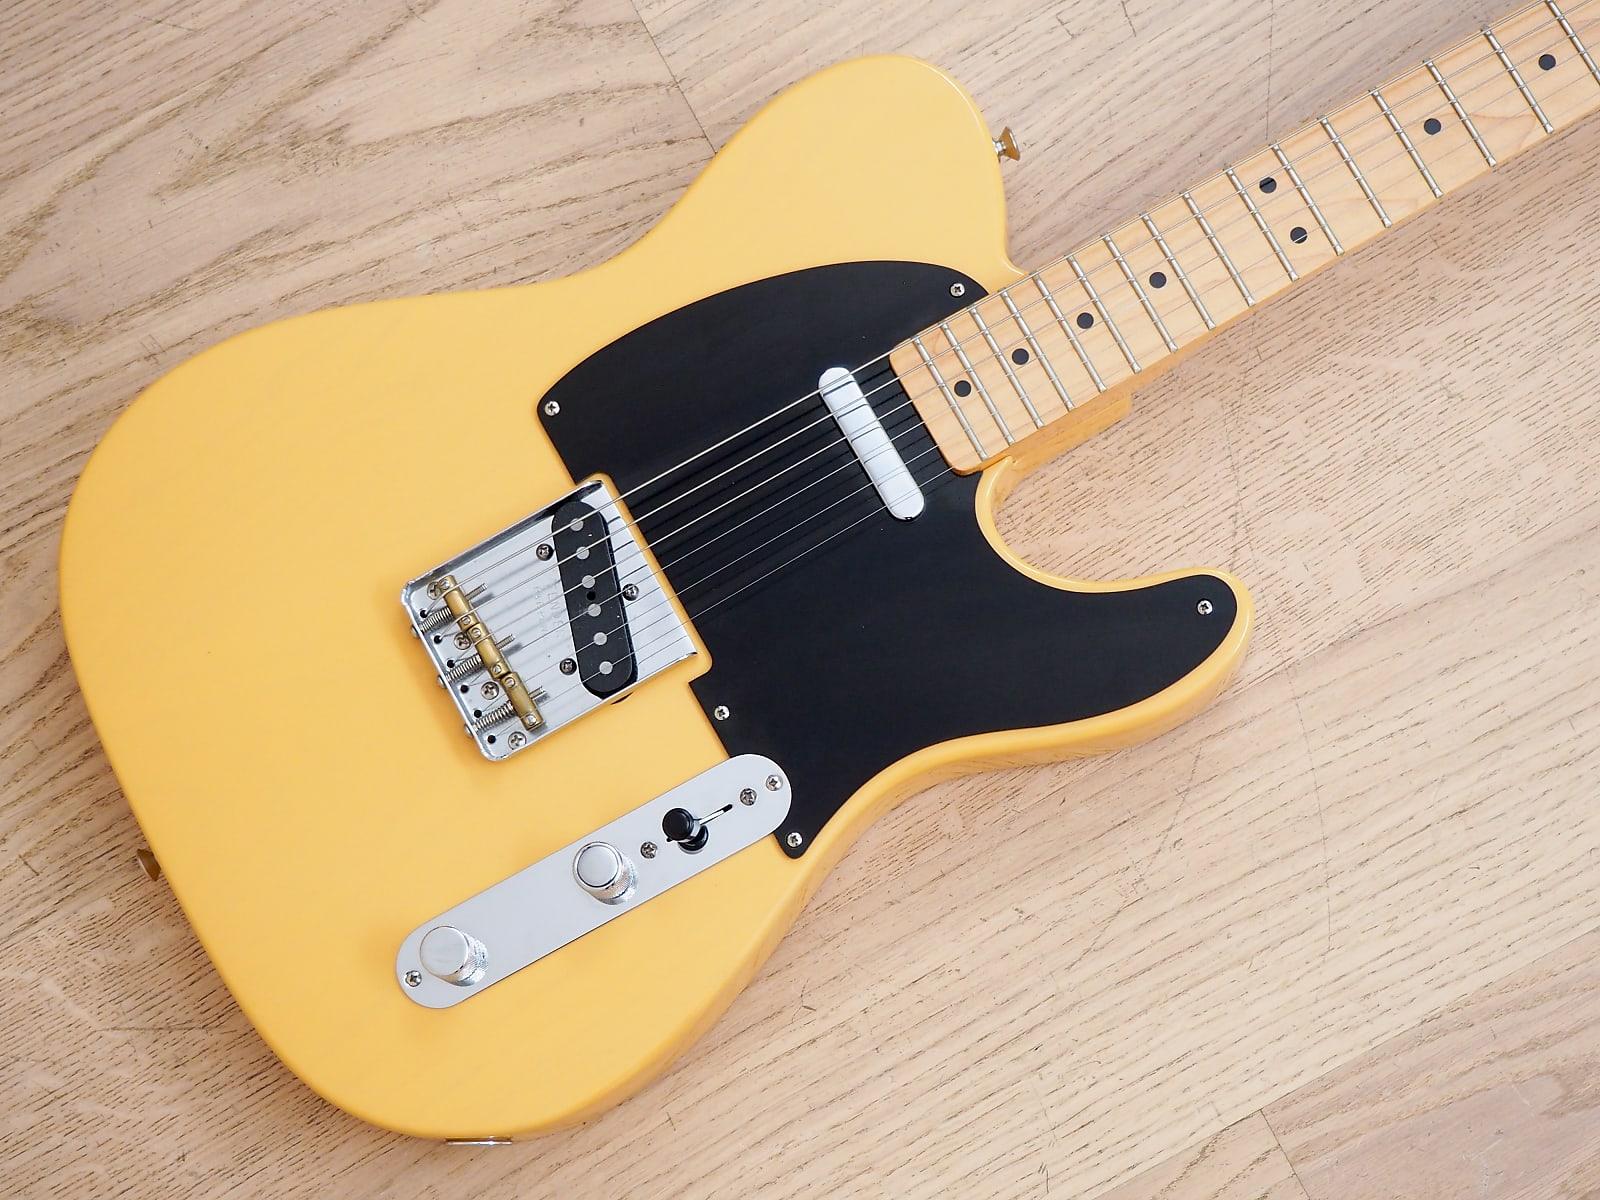 2008 Fender Classic Player Baja Telecaster '50s Vintage Reissue Electric Guitar Butterscotch w/ Bag